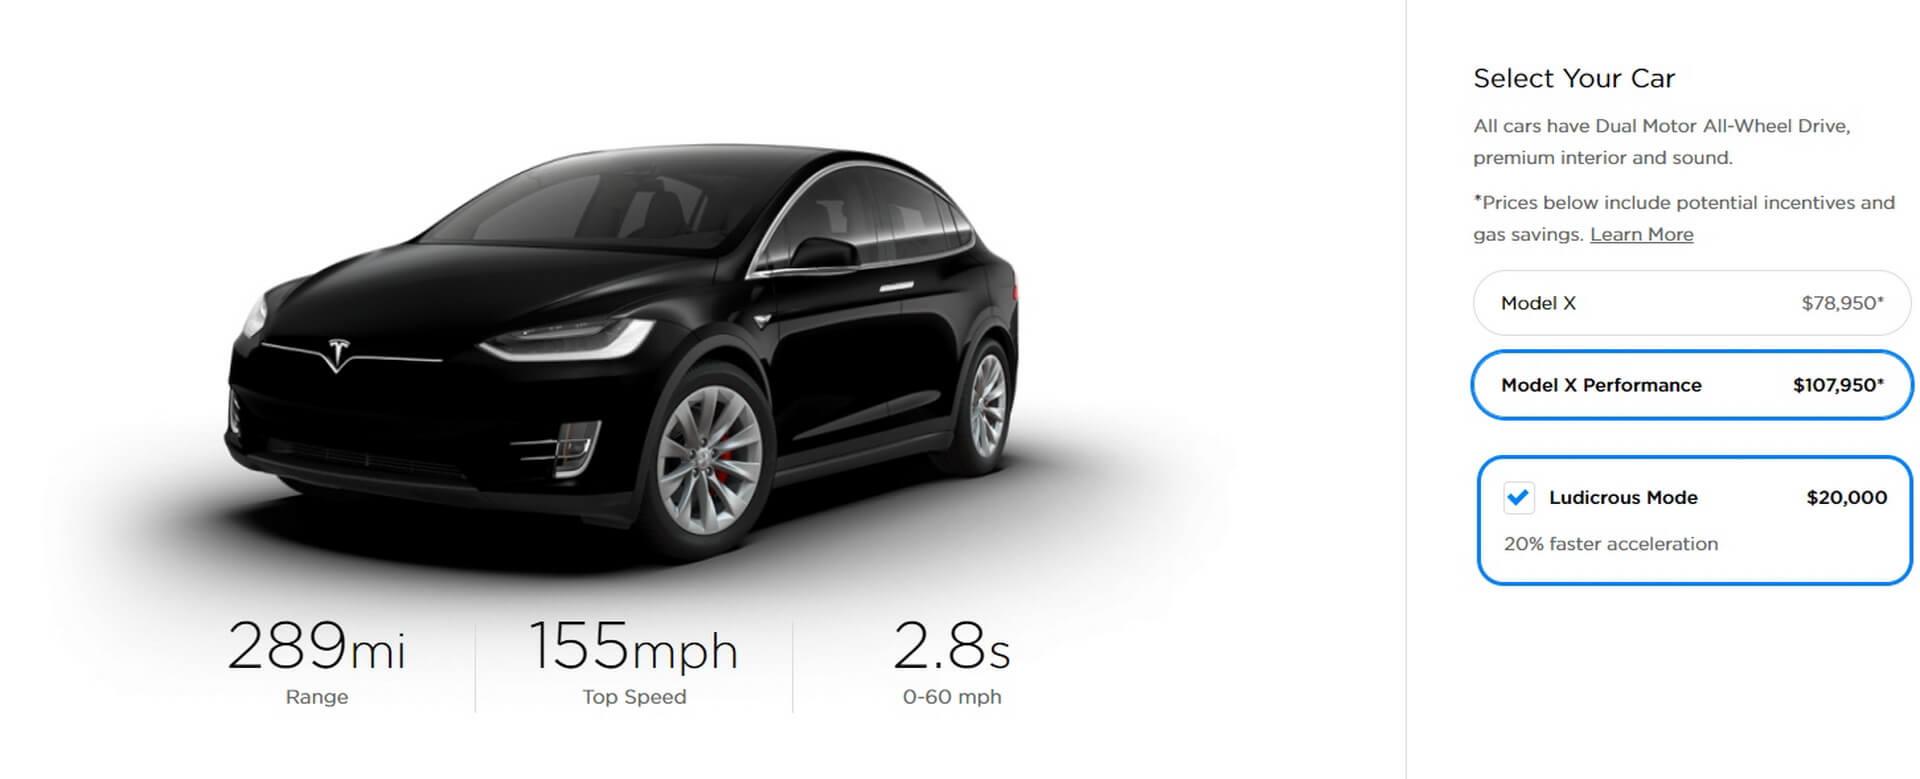 Tesla Model XPerformance + «Ludicrous Mode»